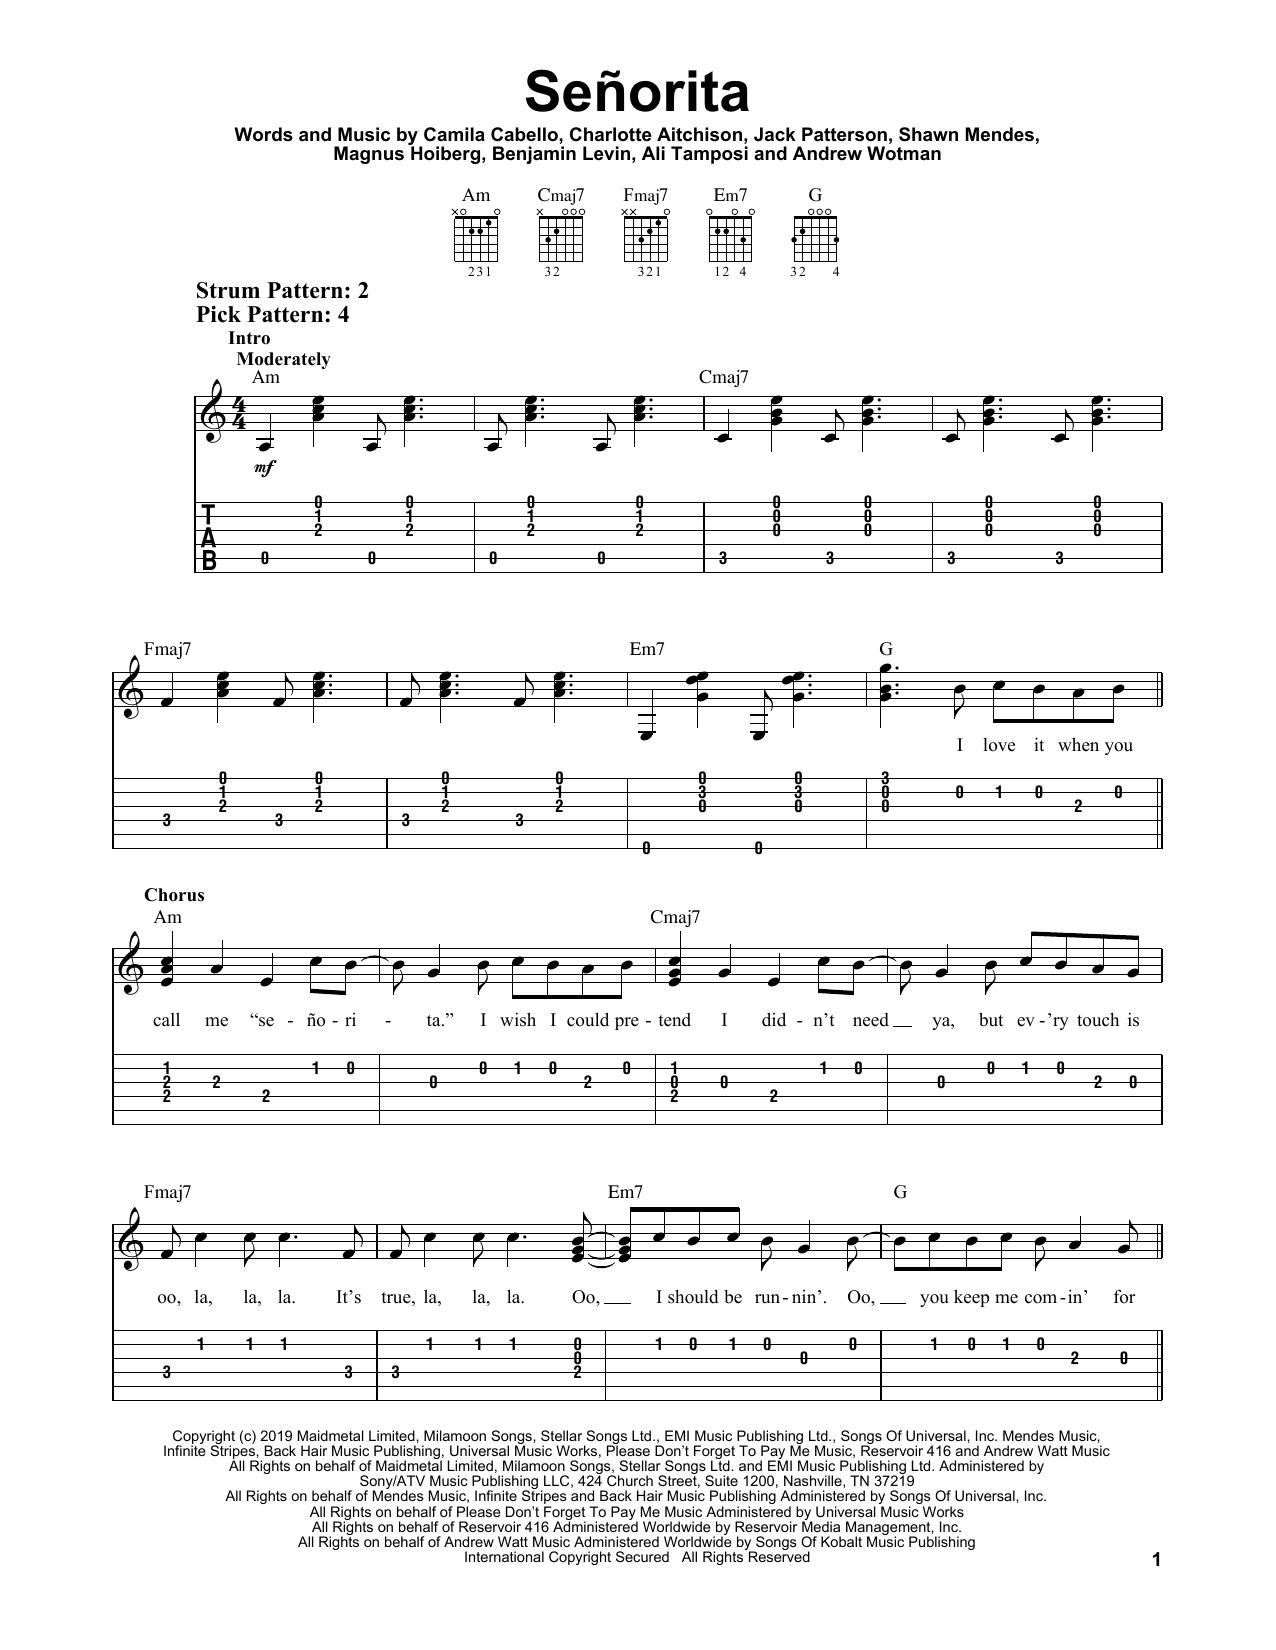 Kunci Gitar Senorita : kunci, gitar, senorita, Chord, Guitar, Senorita, Health, Tips,Music,Cars, Recipe